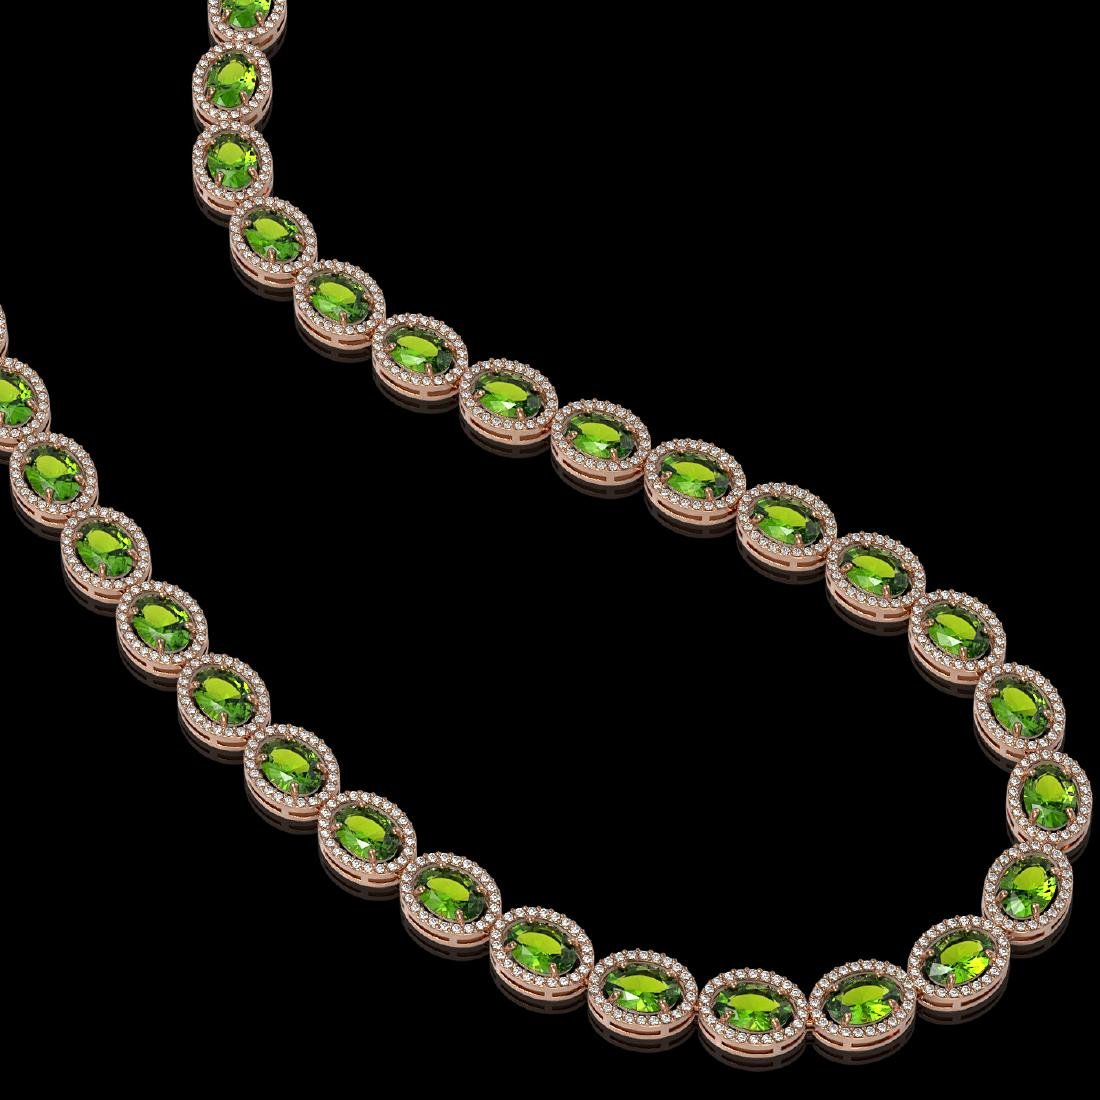 48.14 CTW Peridot & Diamond Halo Necklace 10K Rose Gold